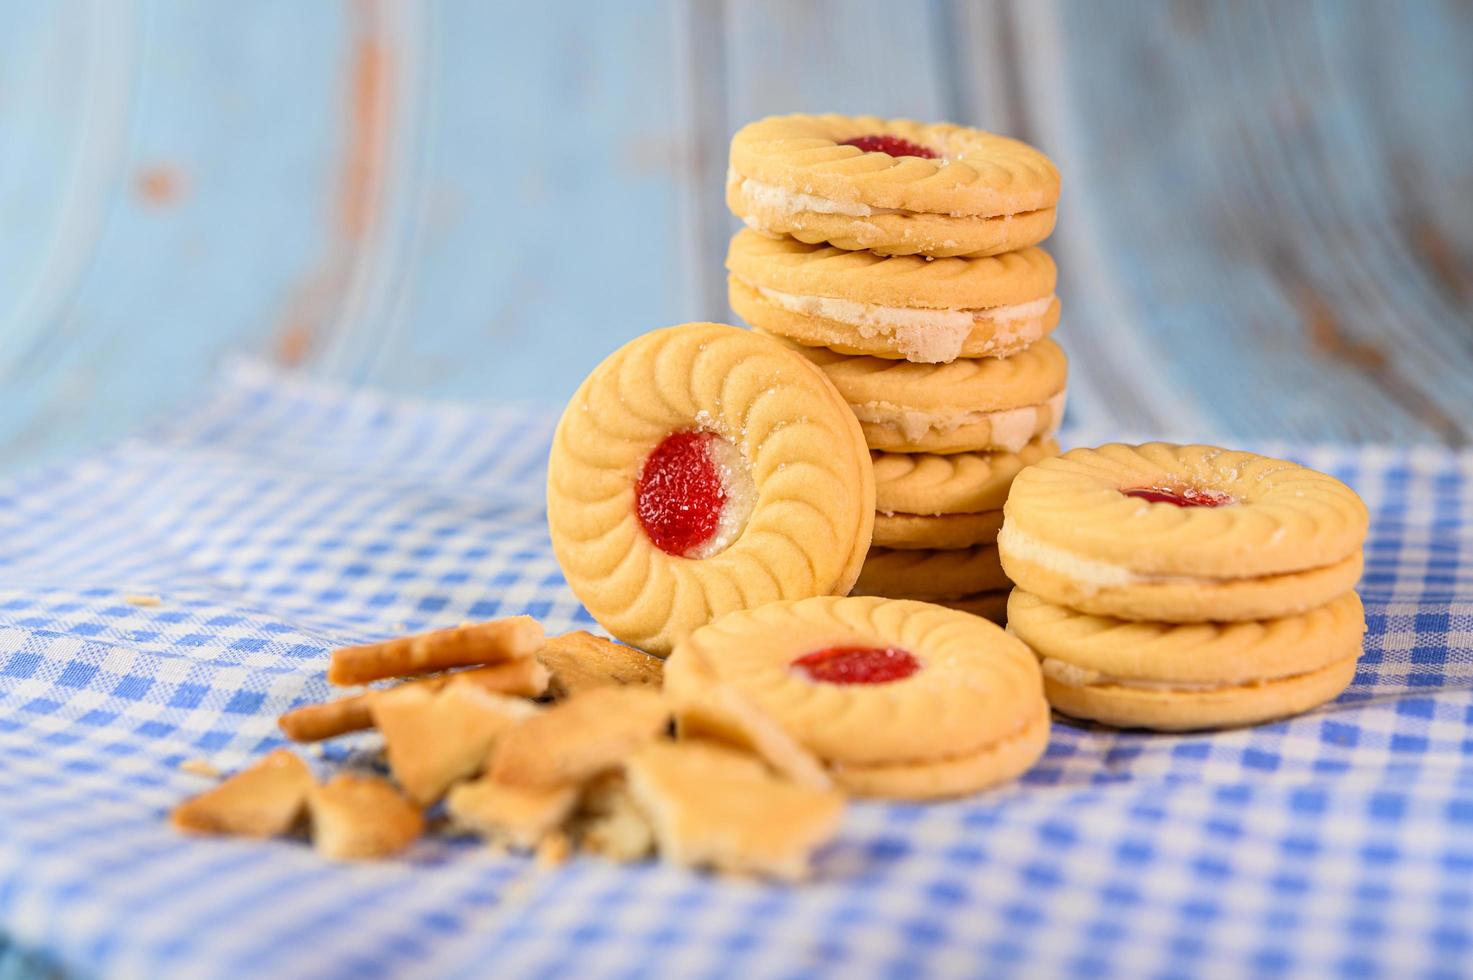 Sandwichkekse mit Erdbeercreme foto